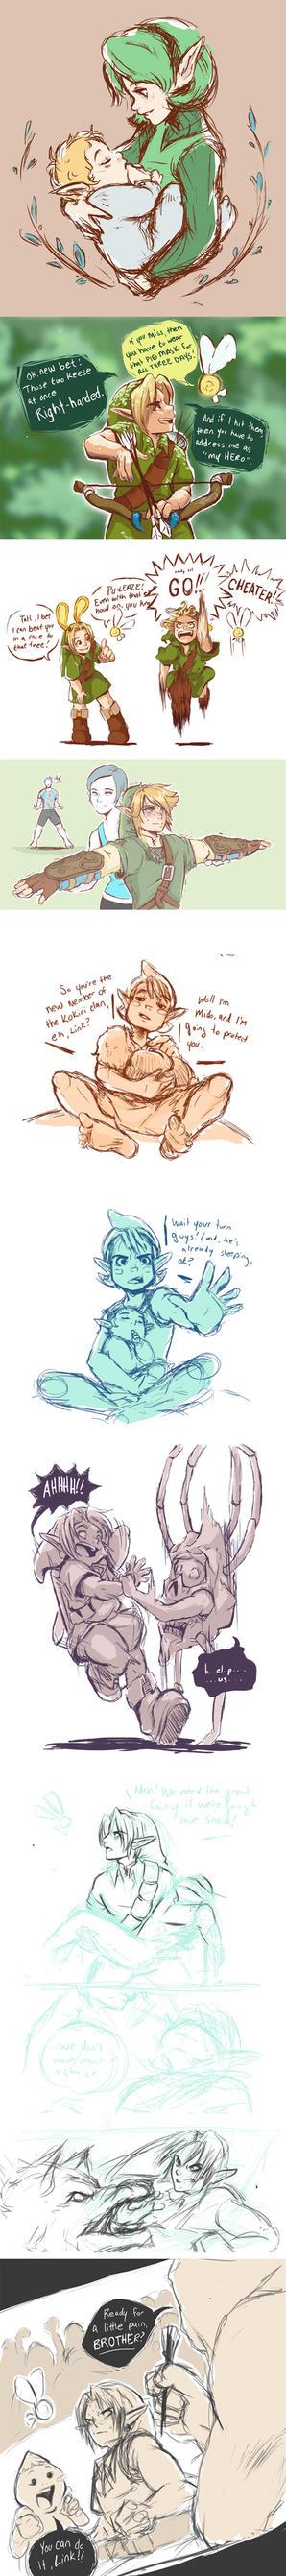 Zelda dump by bossbetch